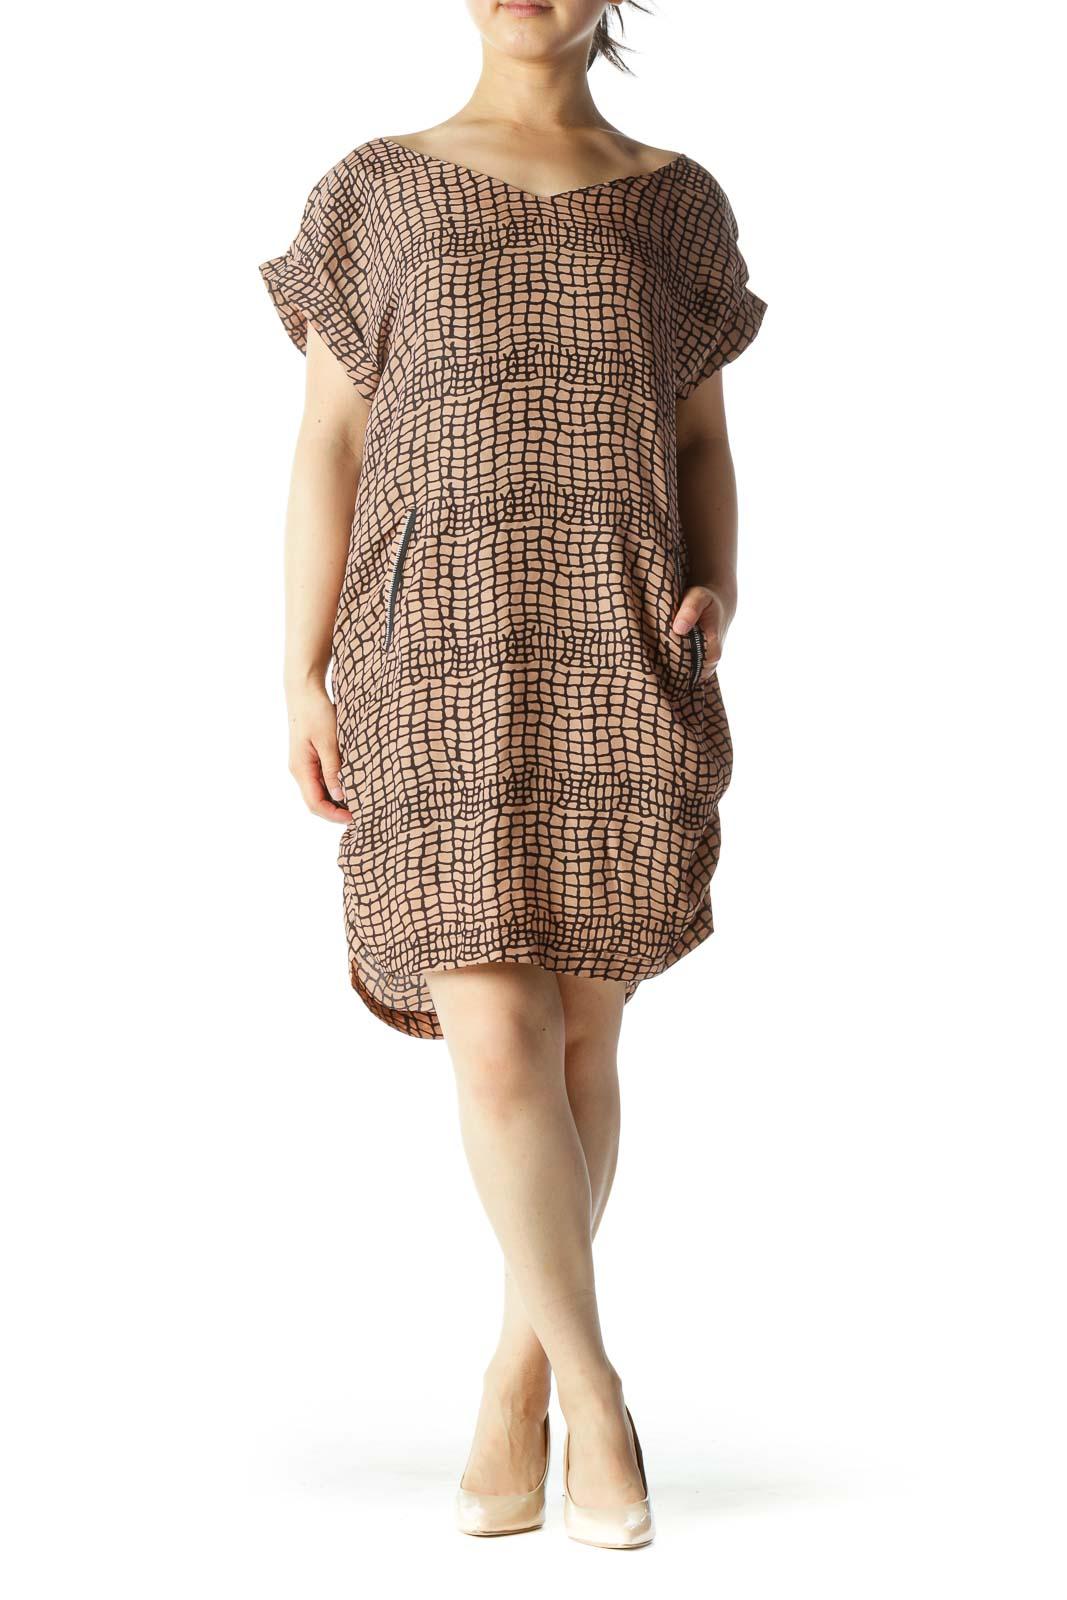 Light Peach Black Short Sleeve Crocodile Print Zipper Accents Dress